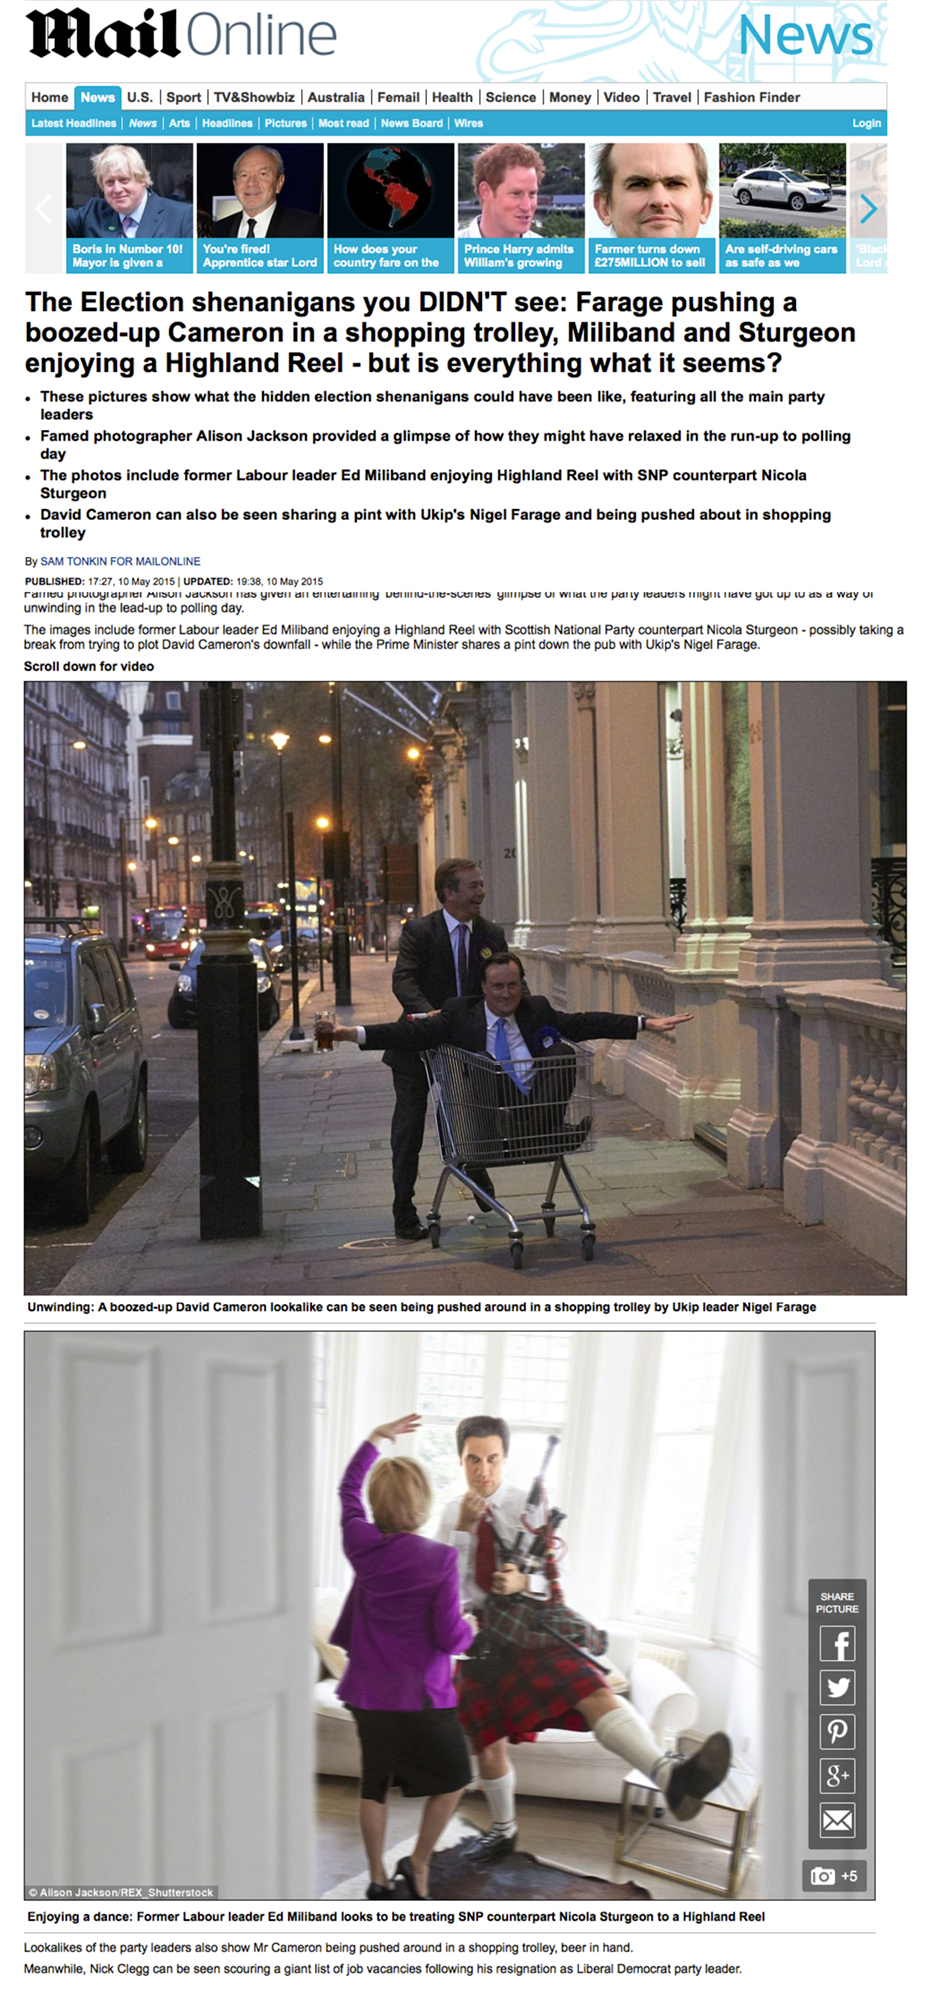 MailOnline-Farage-Cameron-100515-1.jpg